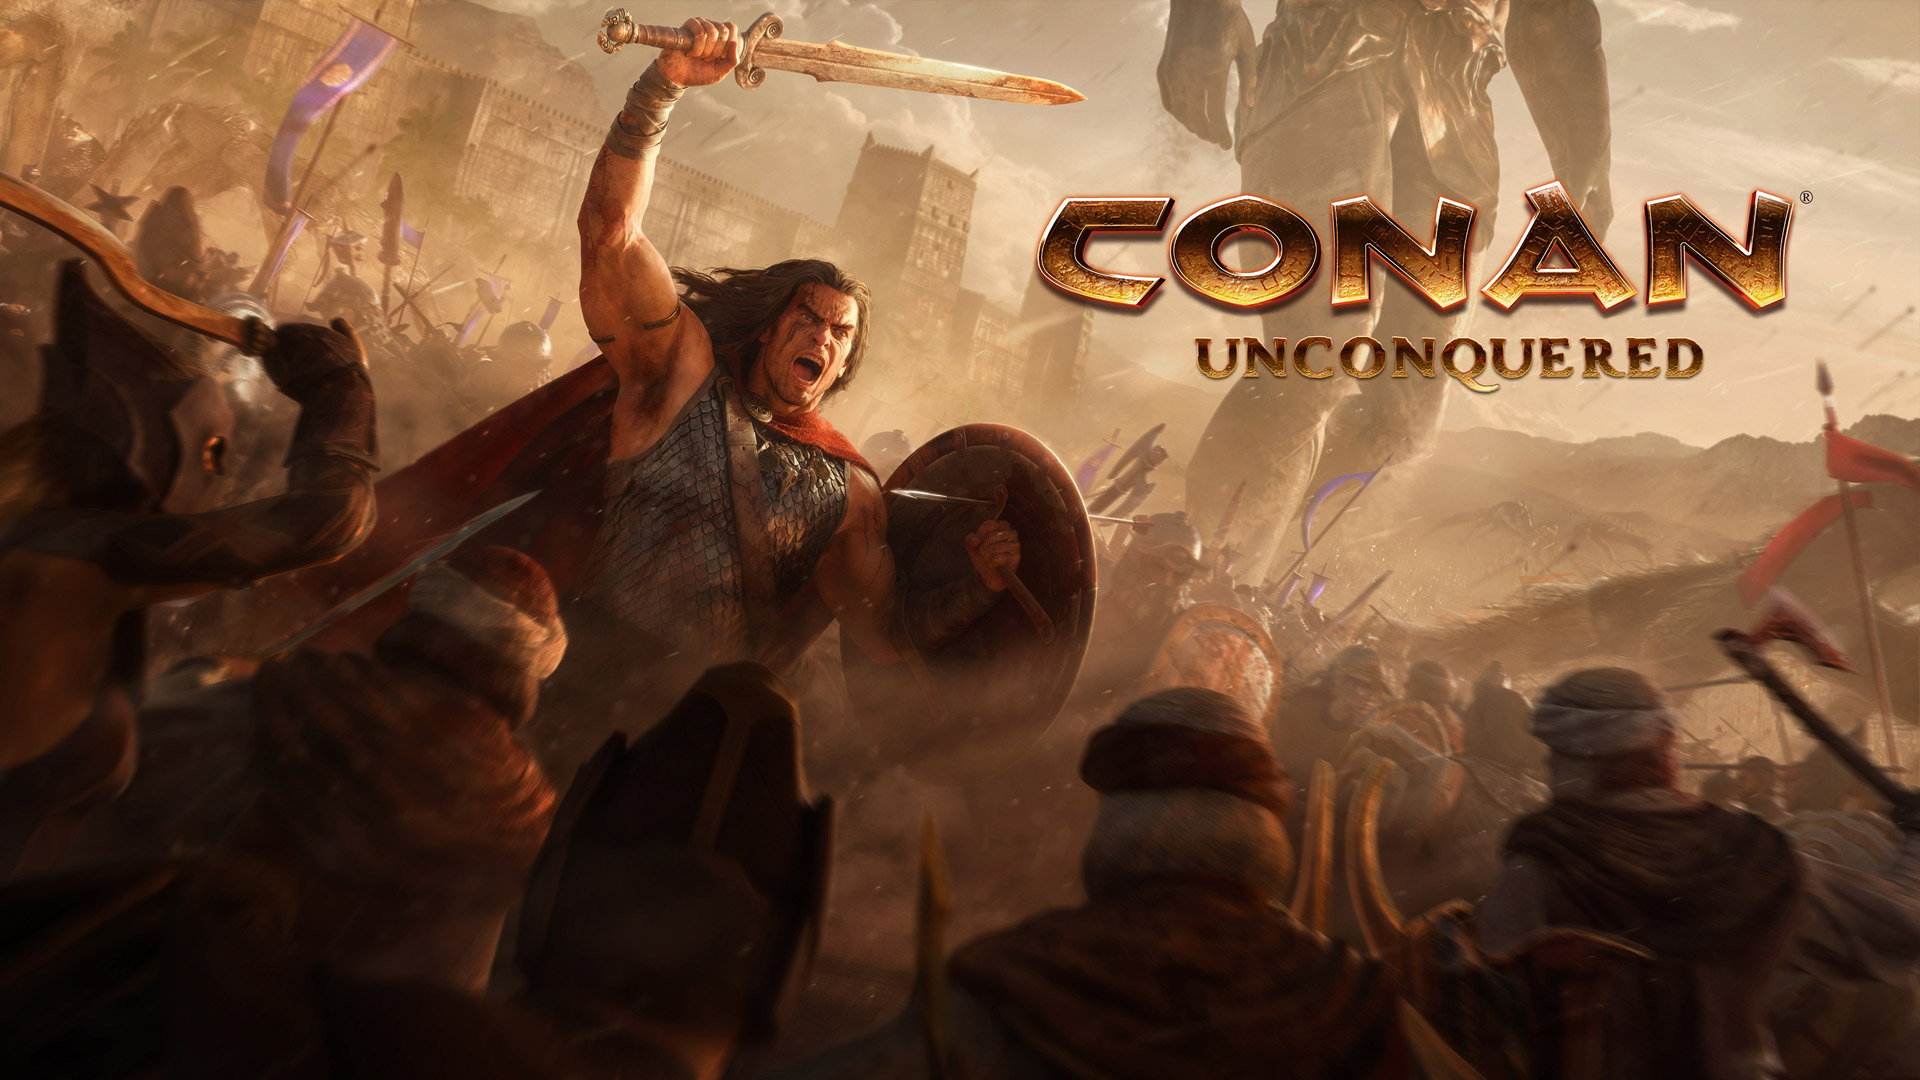 Free Conan Unconquered Wallpaper in 1920x1080